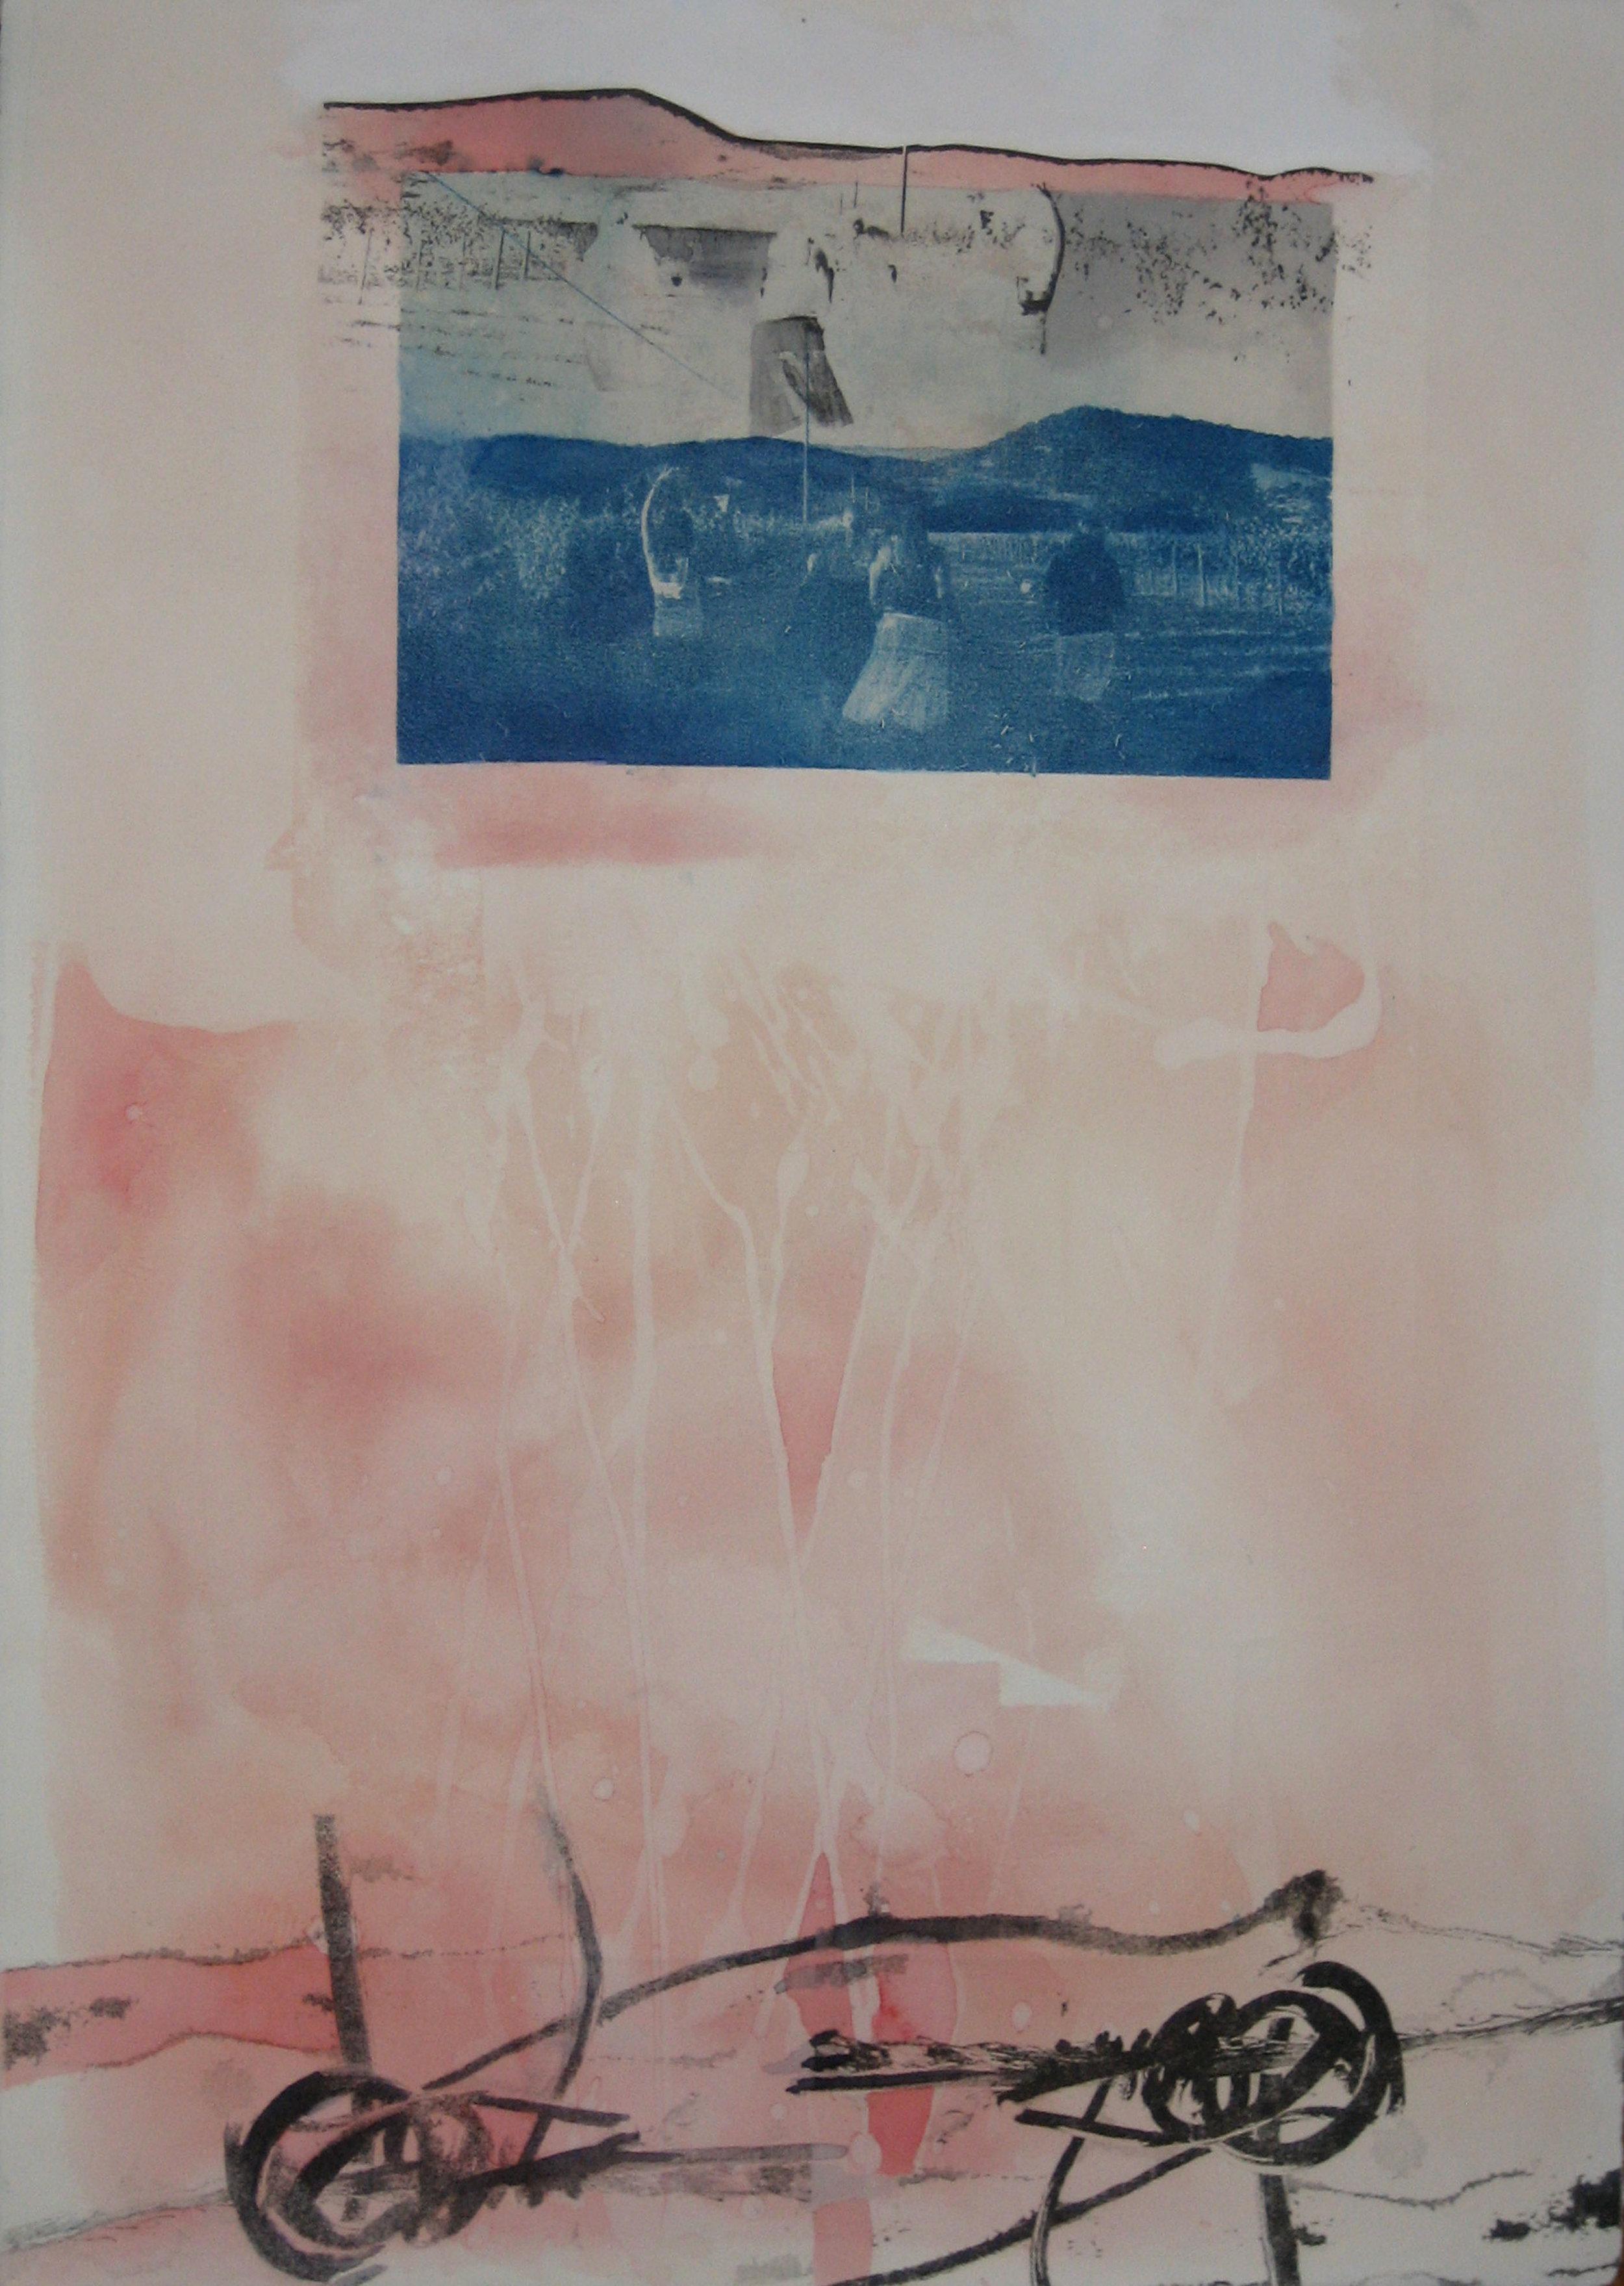 untitled (pinkandblue) , 2008, cyanotype, xerox transfer, watercolor on paper, 20 x 26 inches